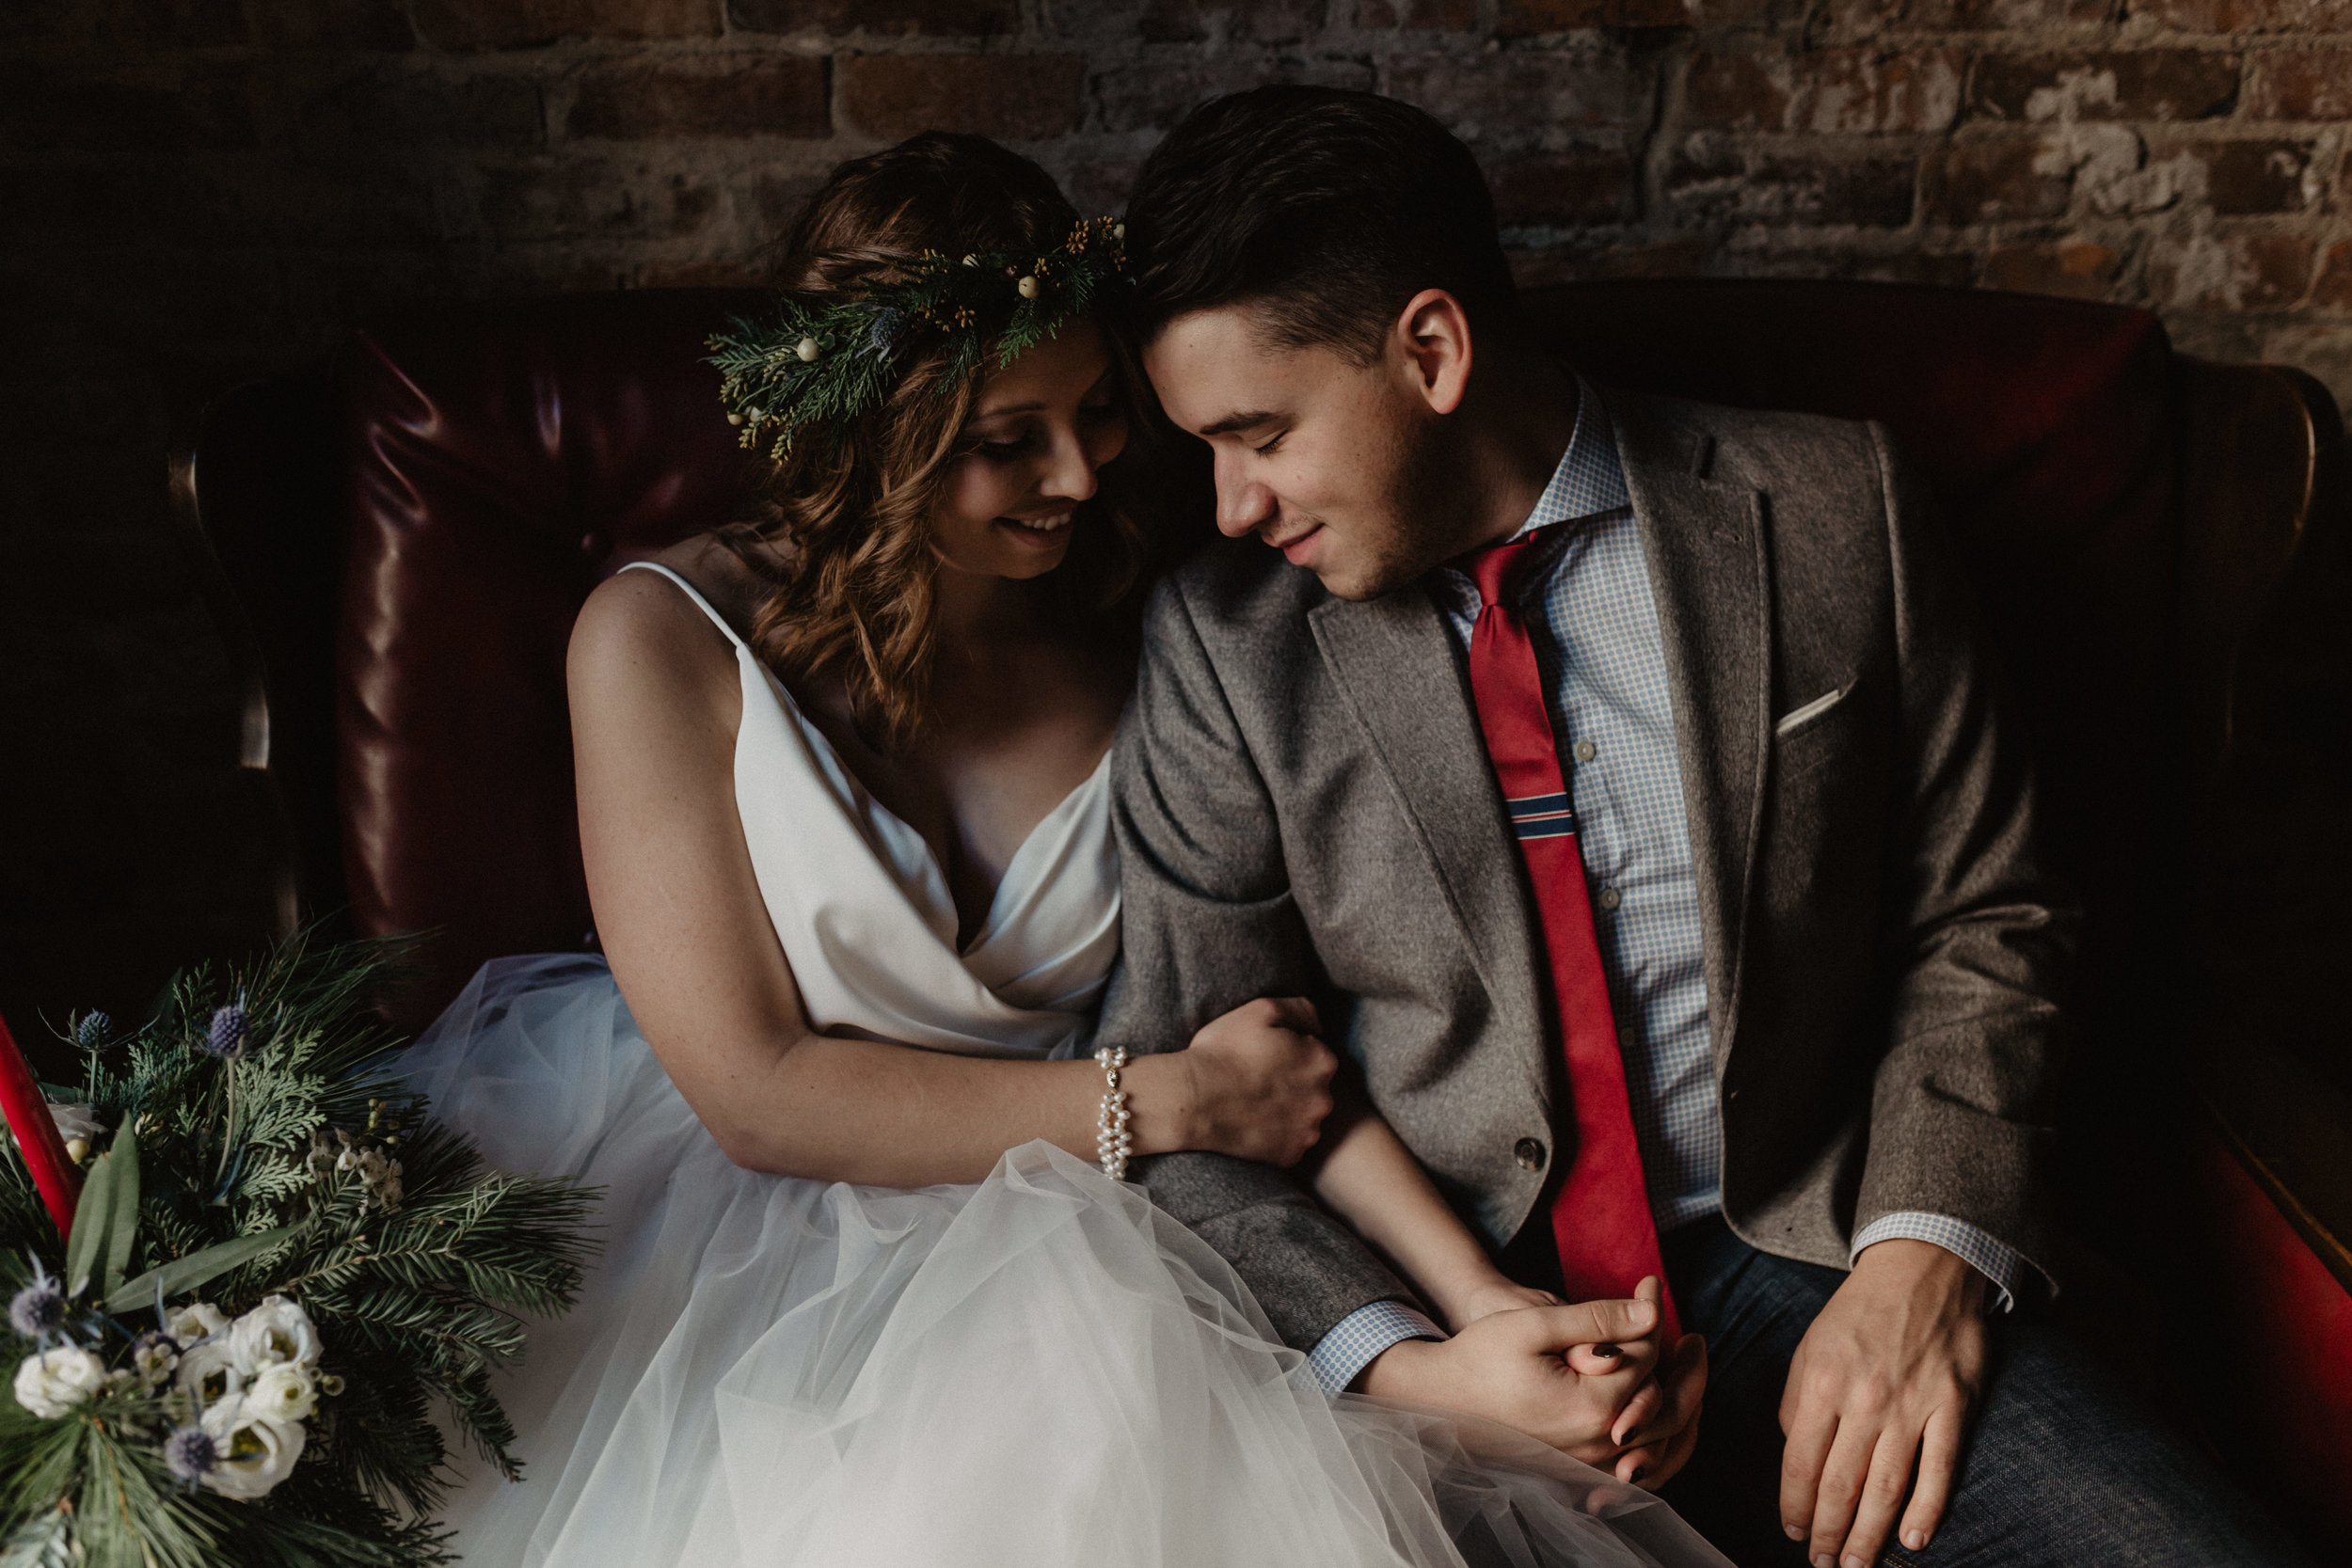 lucas_confectionery_wedding-24.jpg